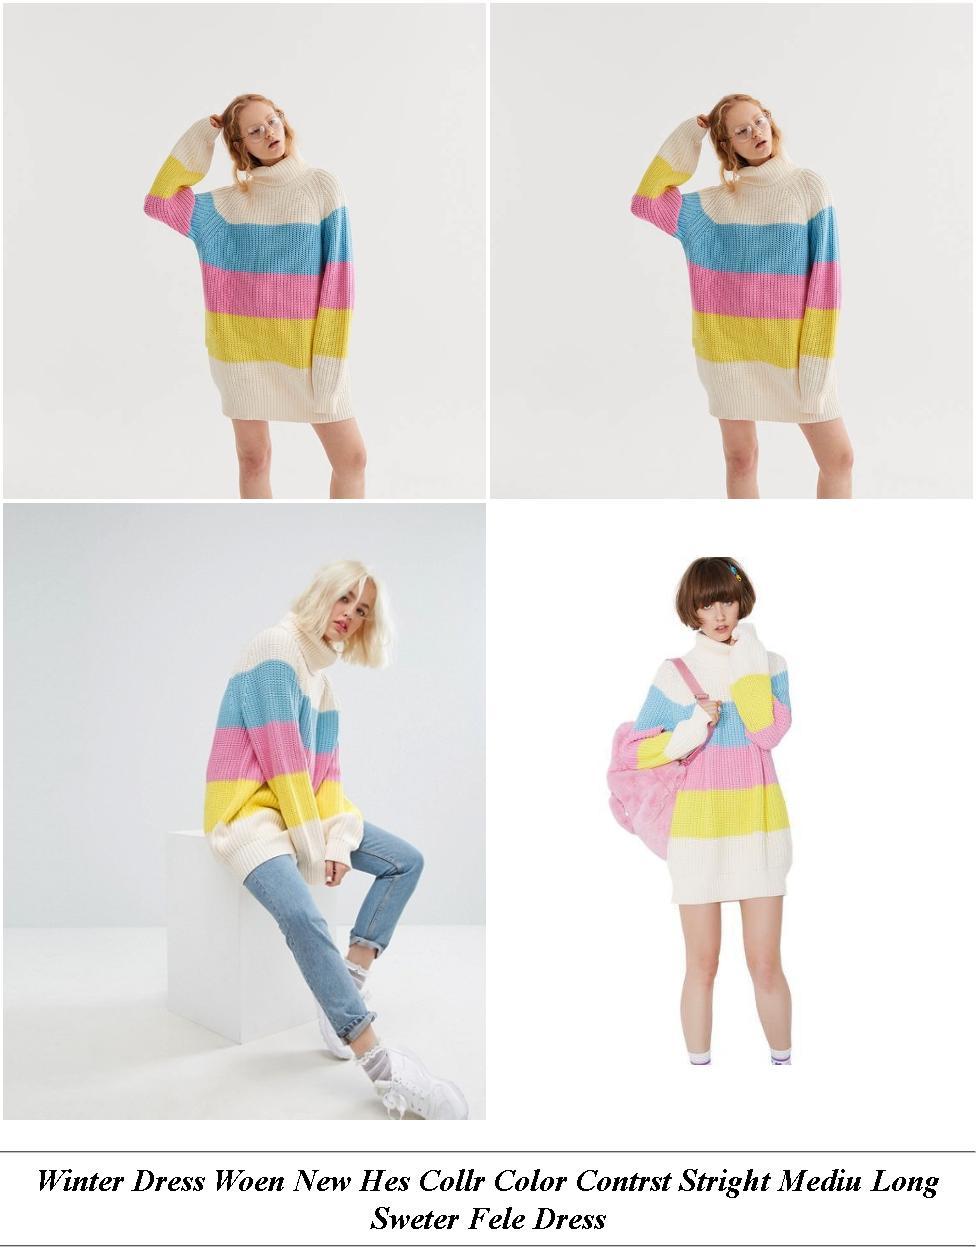 Discount Evening Dresses Uk - Est Ladies Clothes Sale - Dark Yellow Dress Shirt Mens